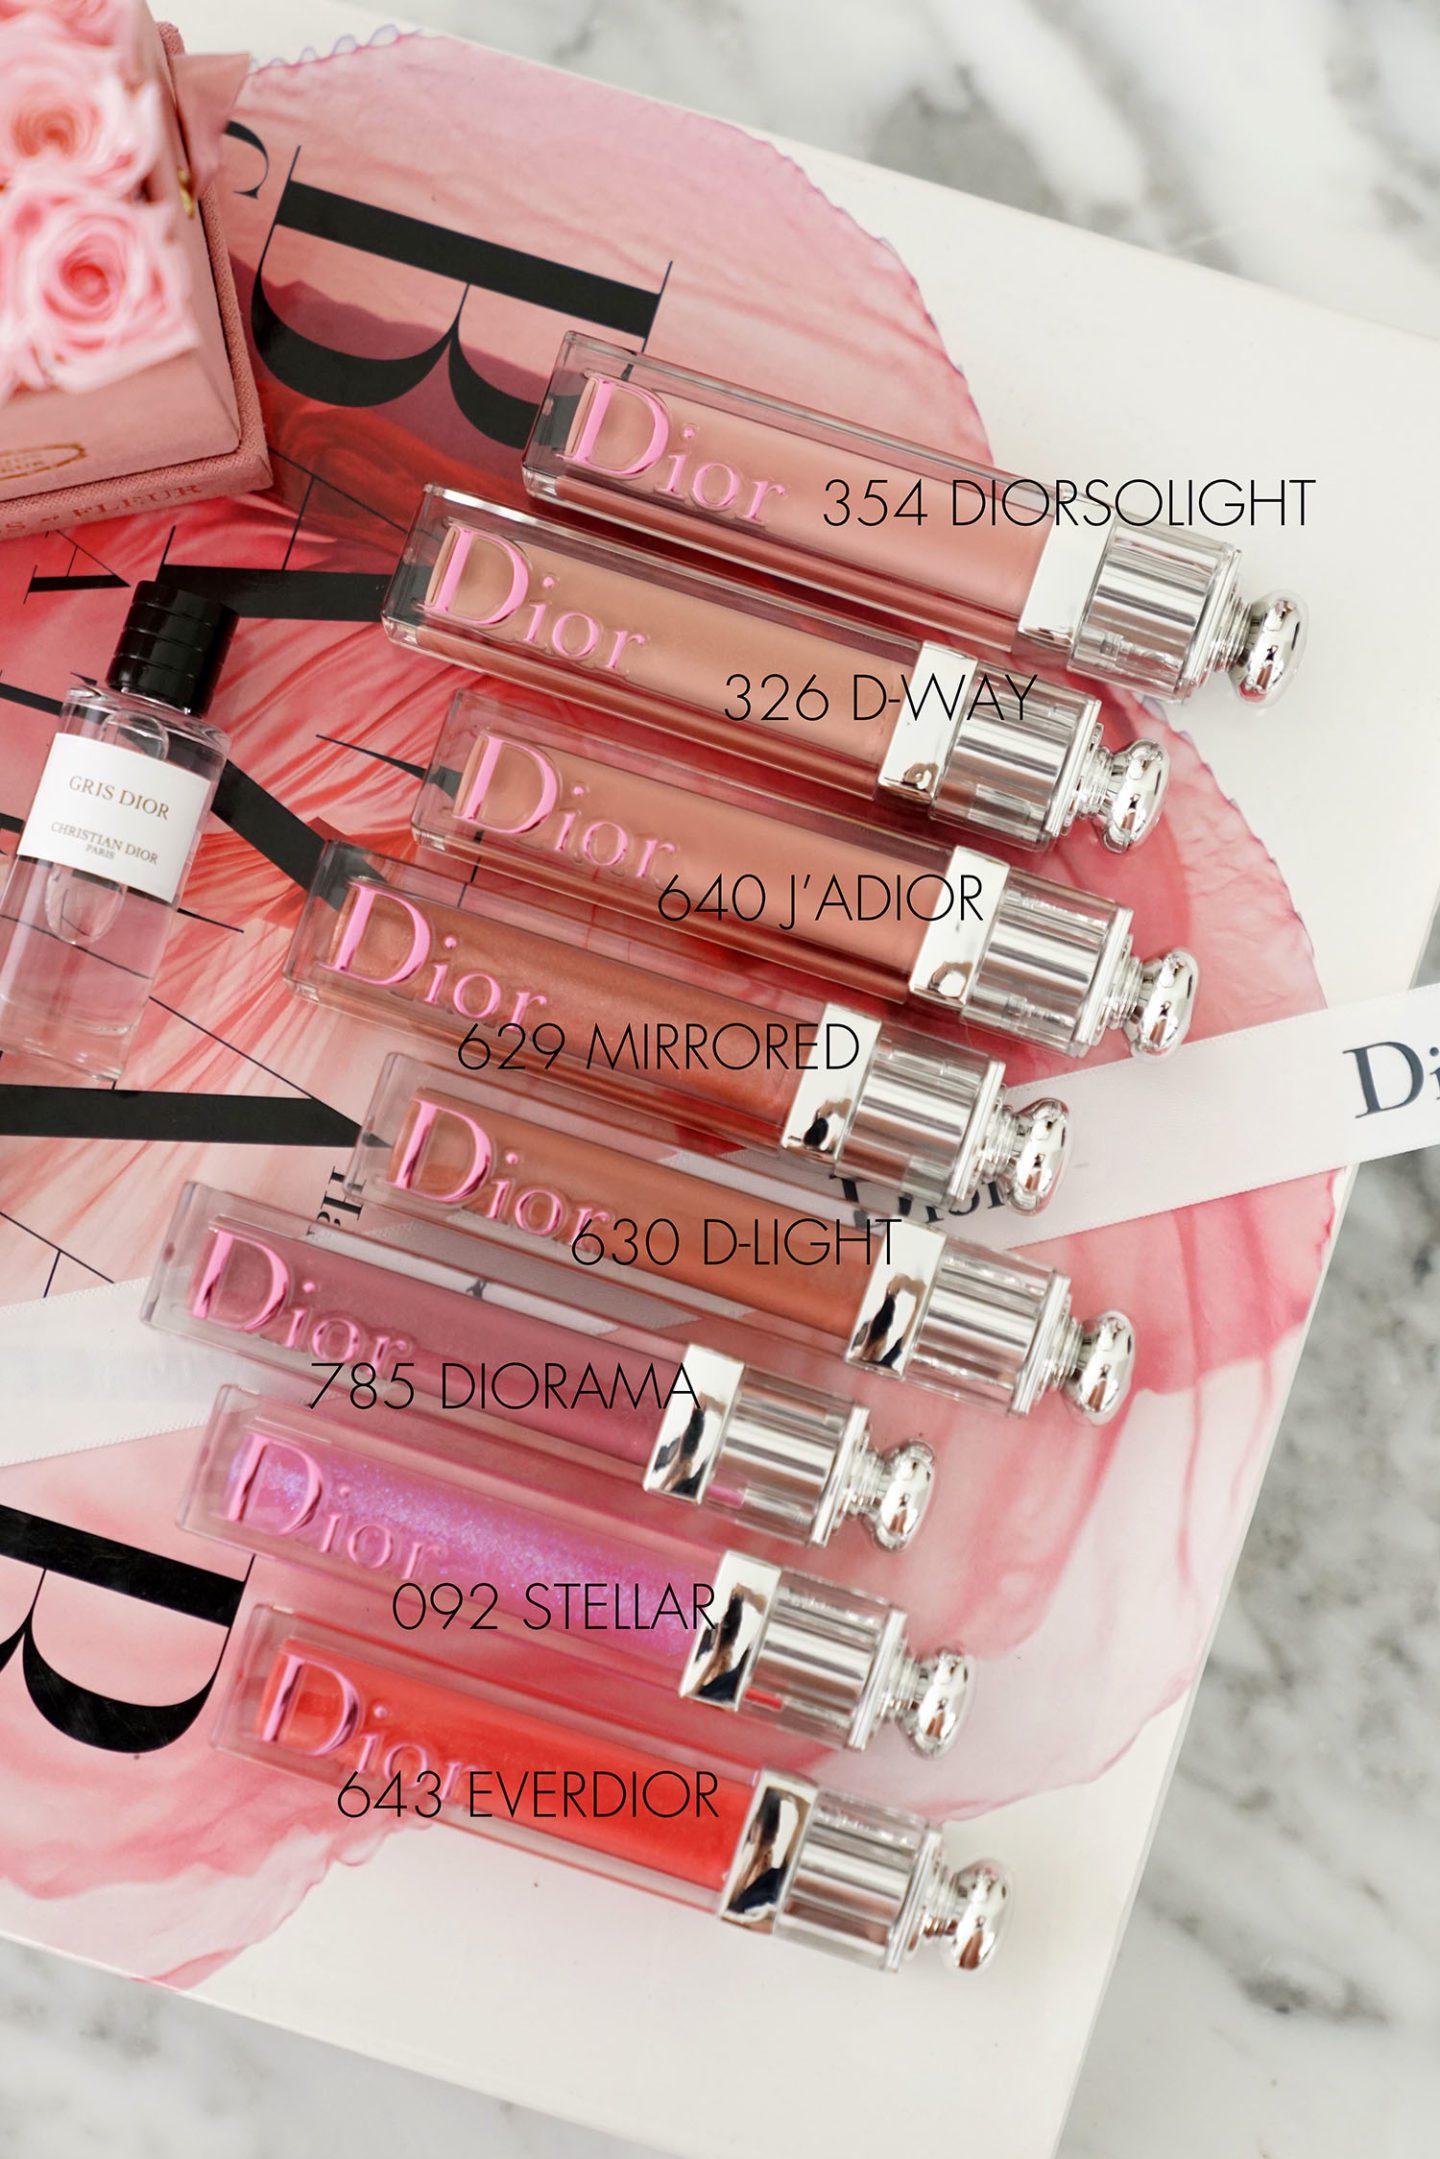 Dior Addict Stellar Gloss haul